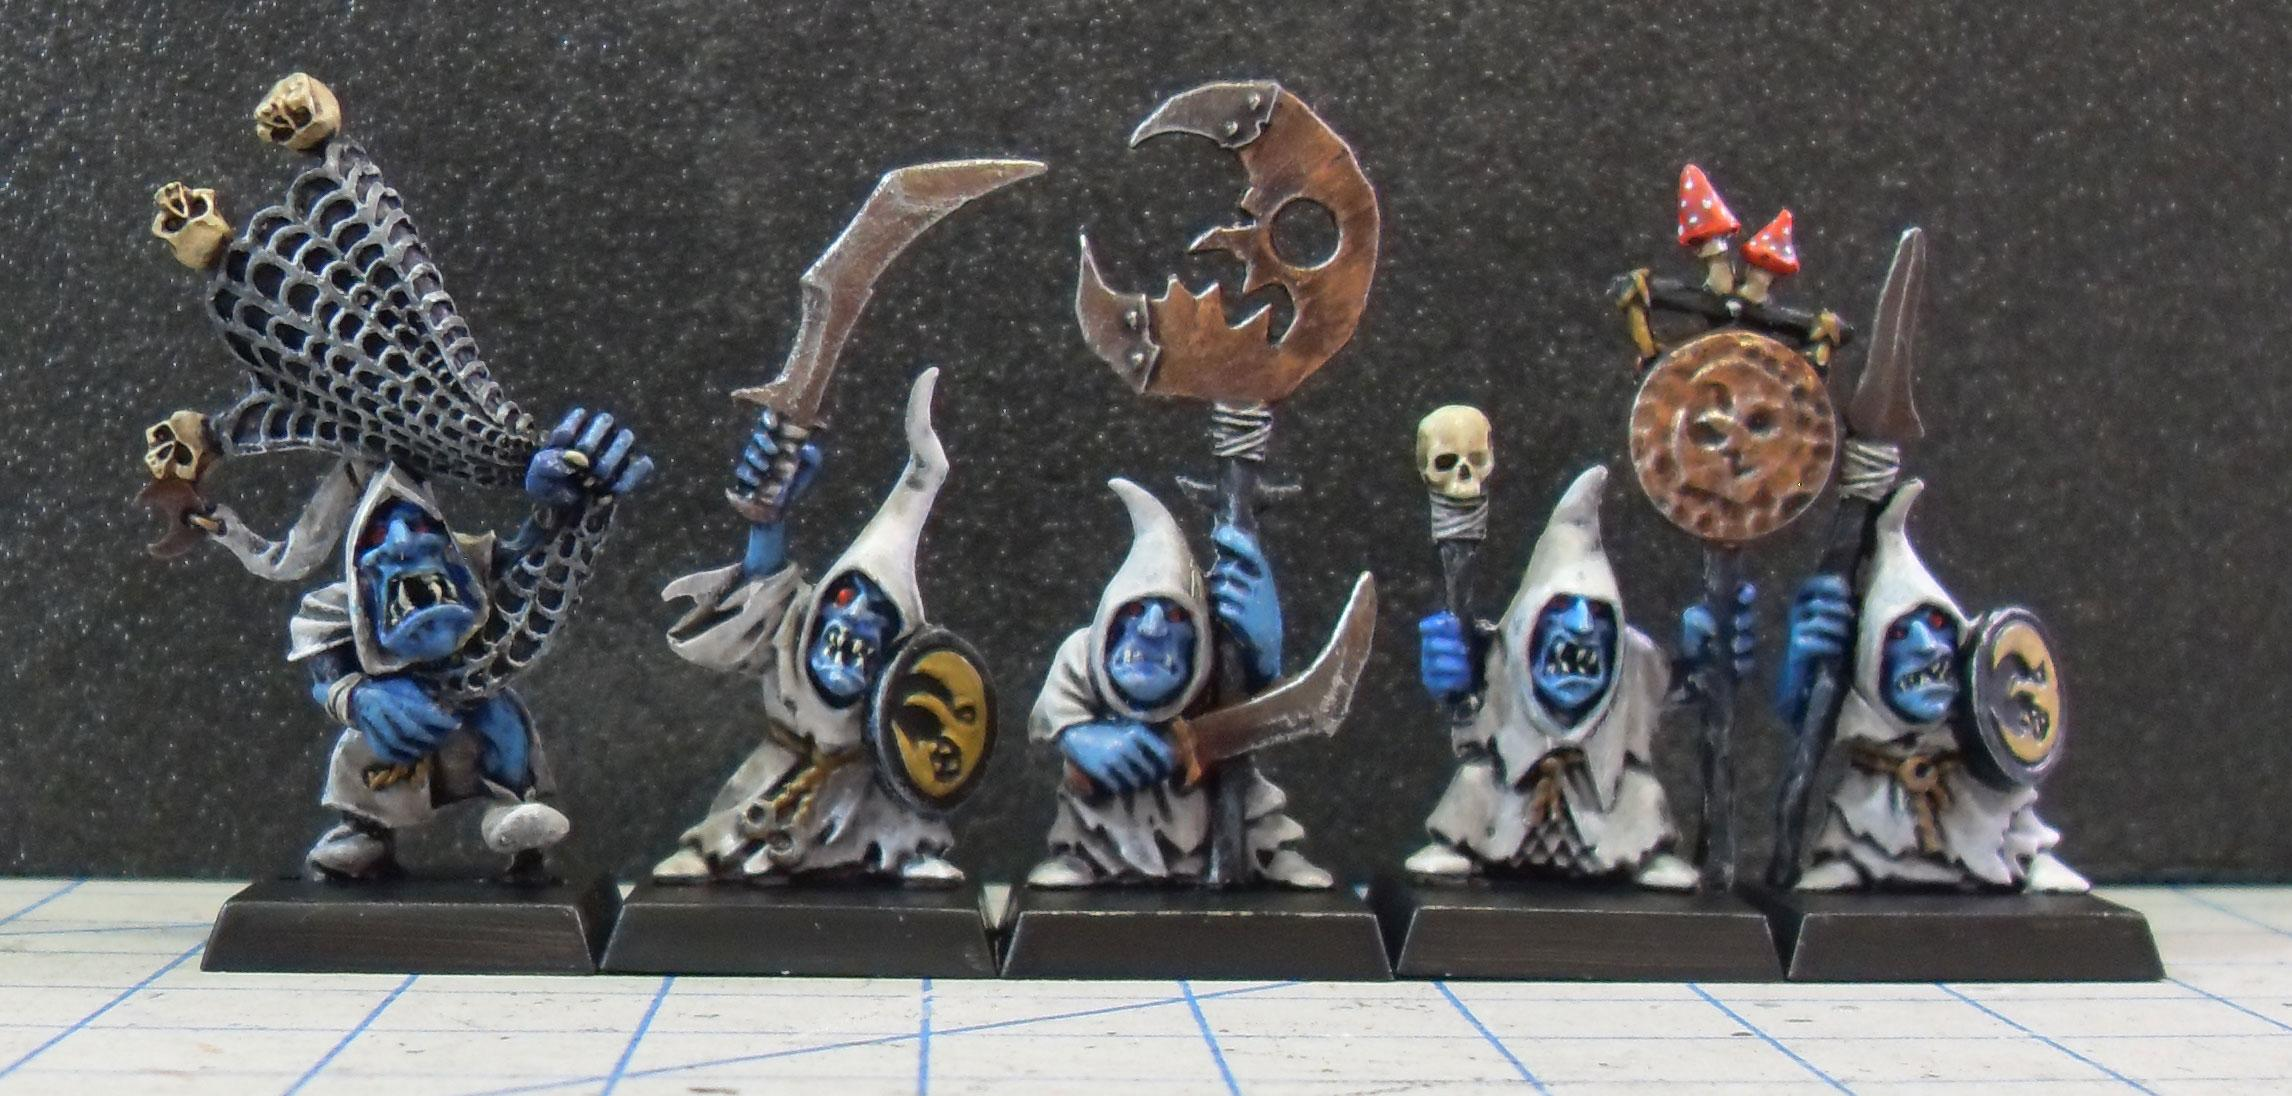 Night Goblins, Smurf, Warhammer Fantasy